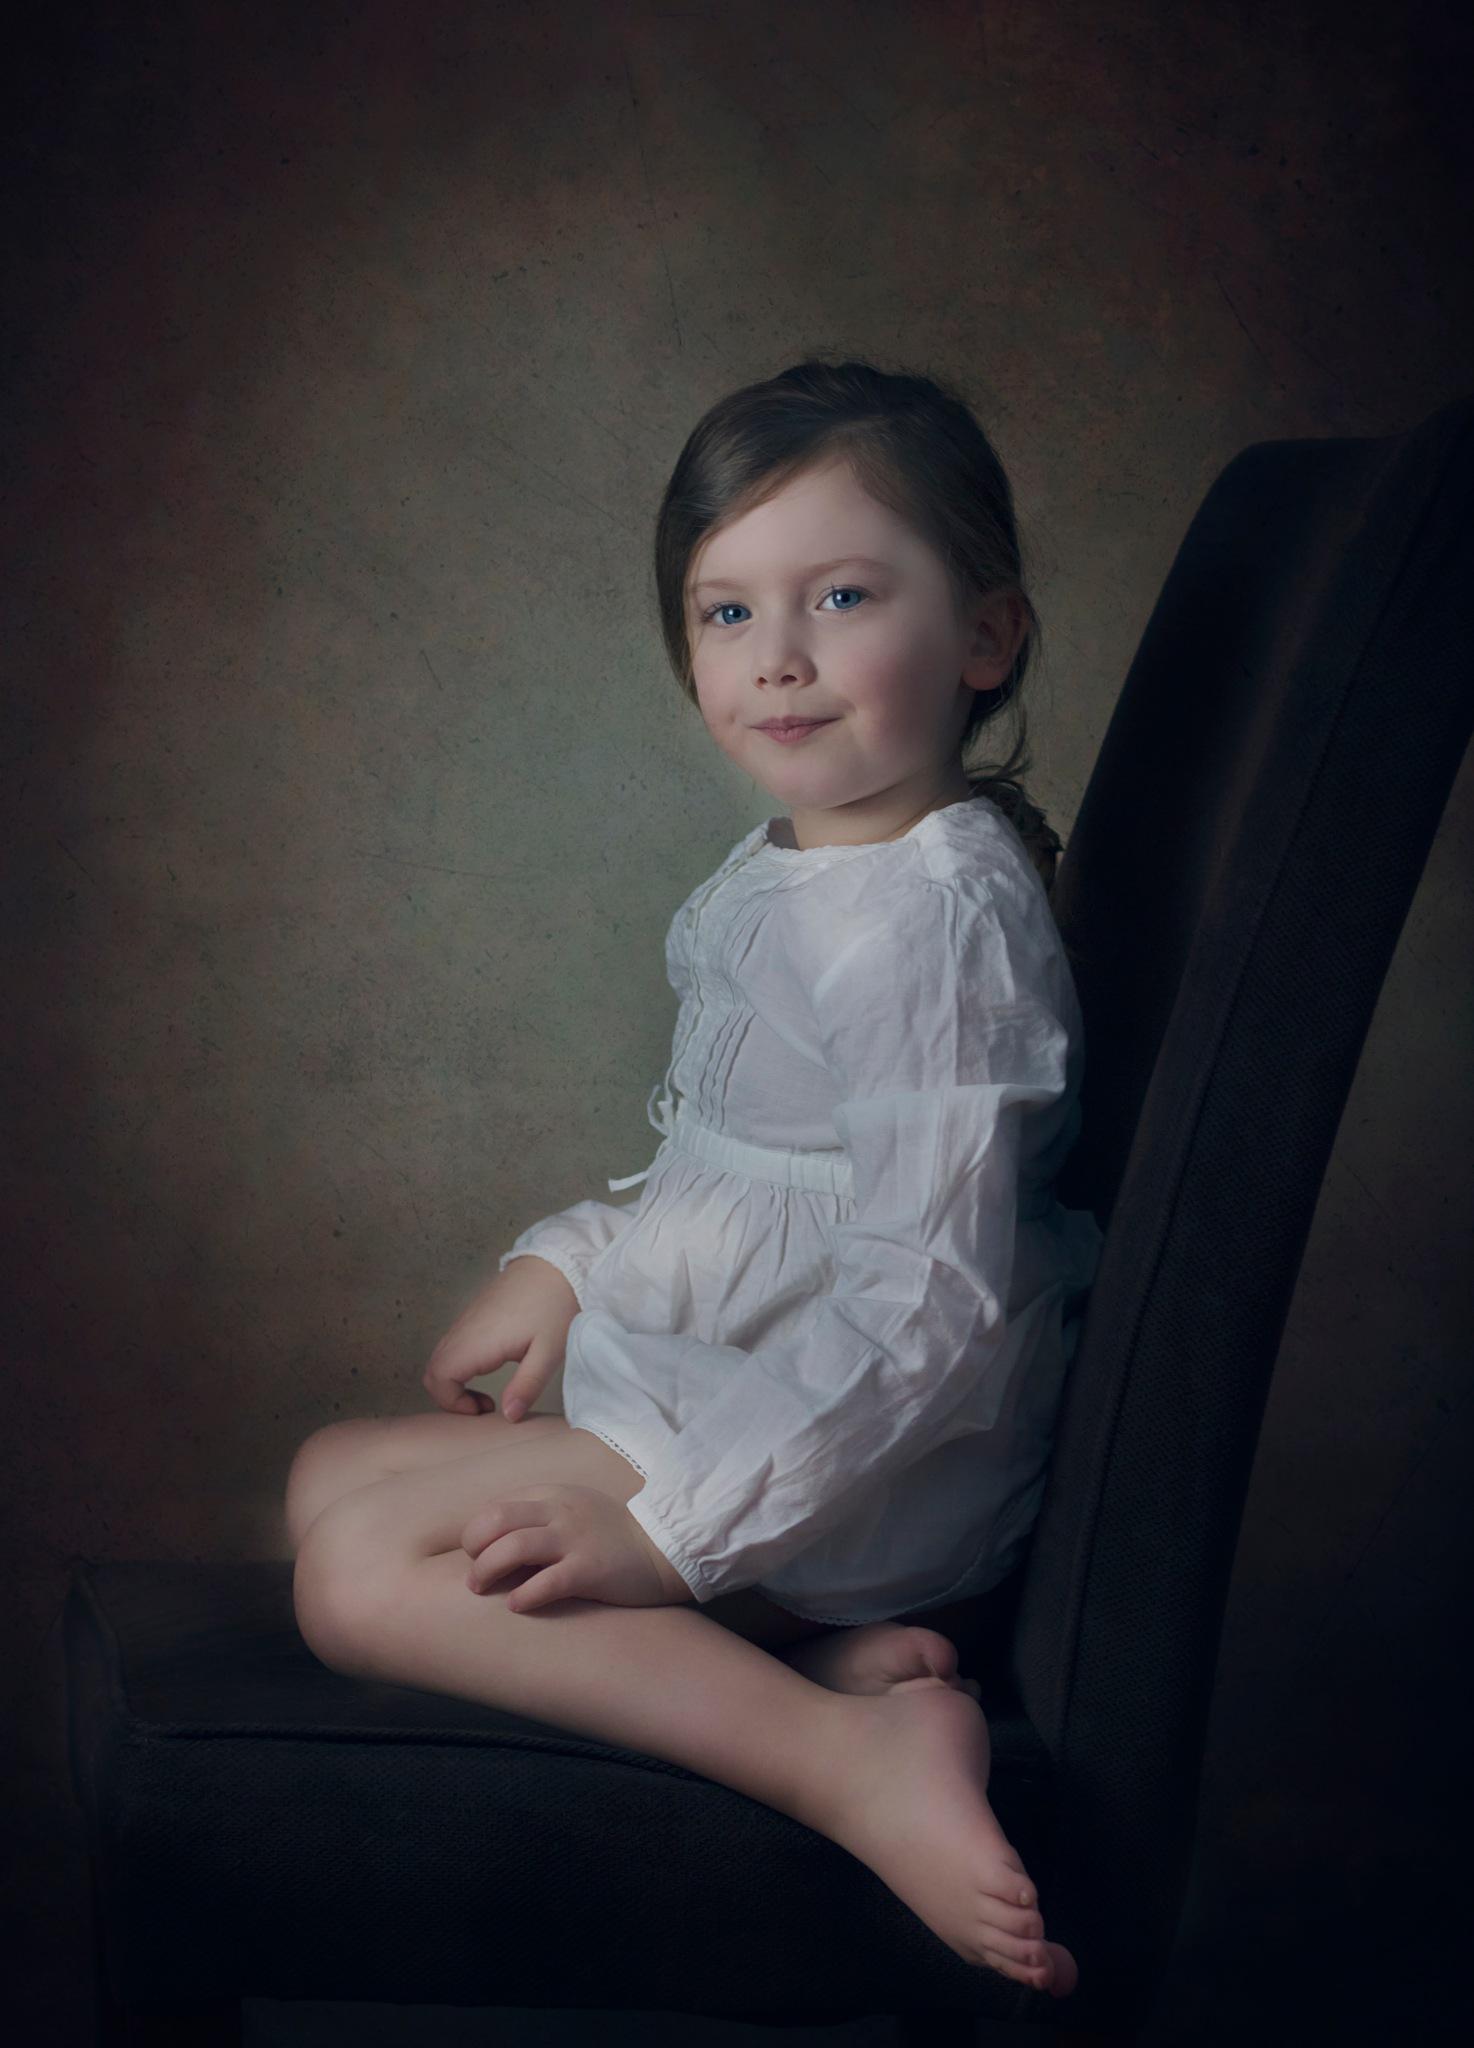 simplicity by Daniëlle